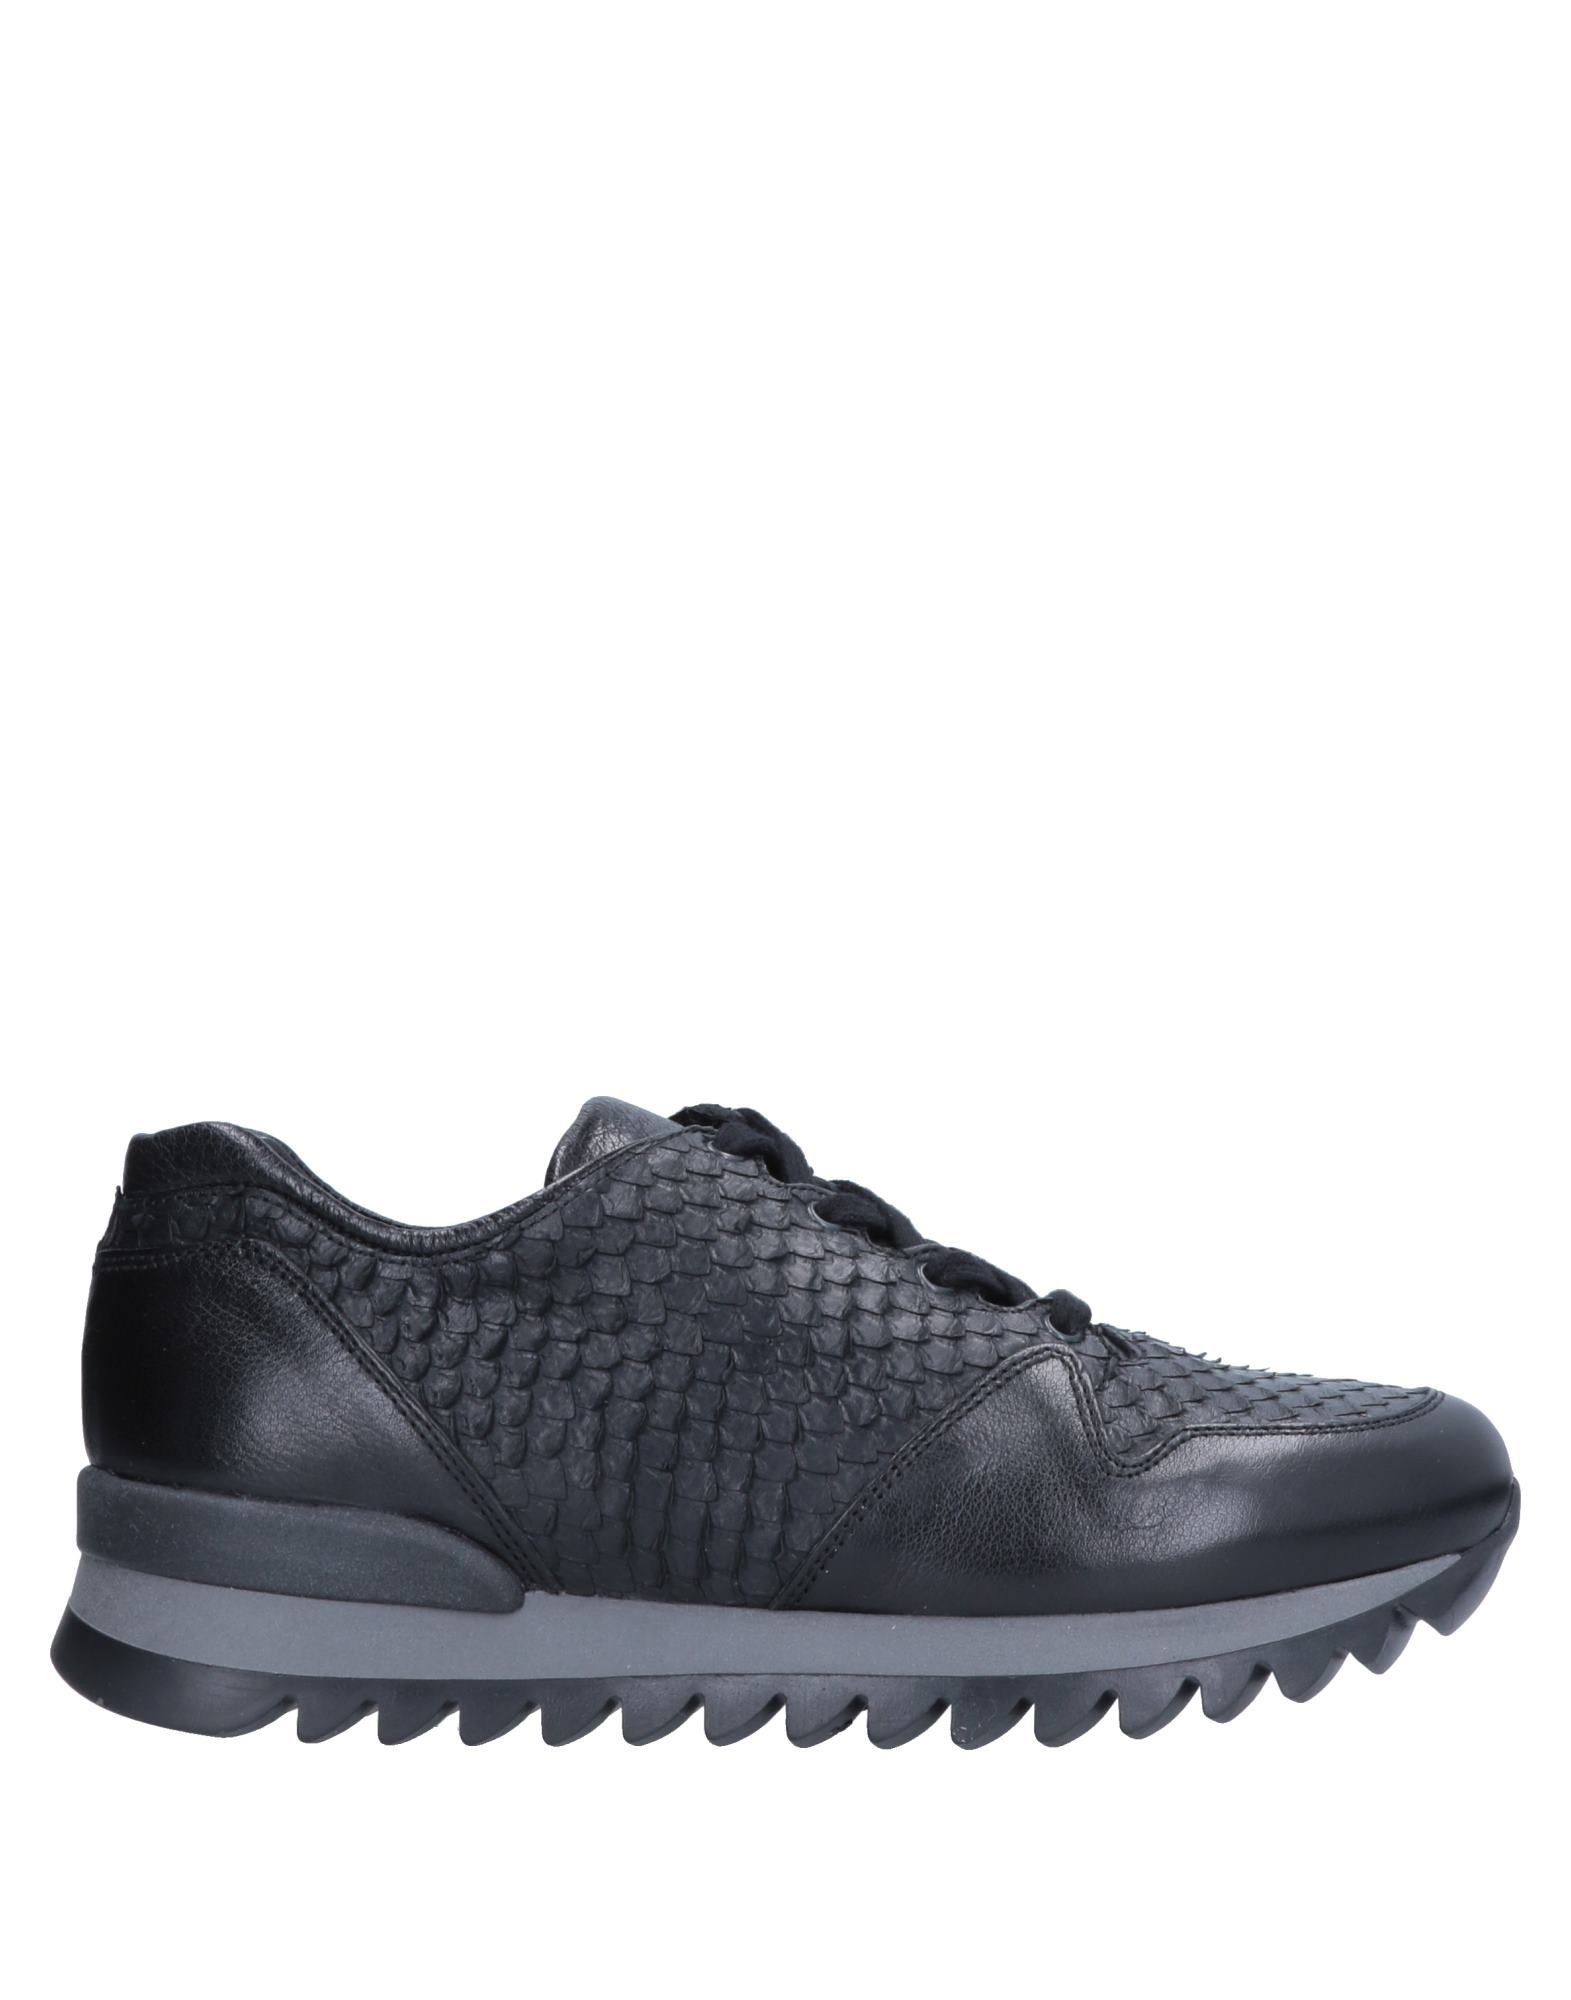 Gut um billige Schuhe zu tragenLaura Bellariva Sneakers Damen  11546219VK